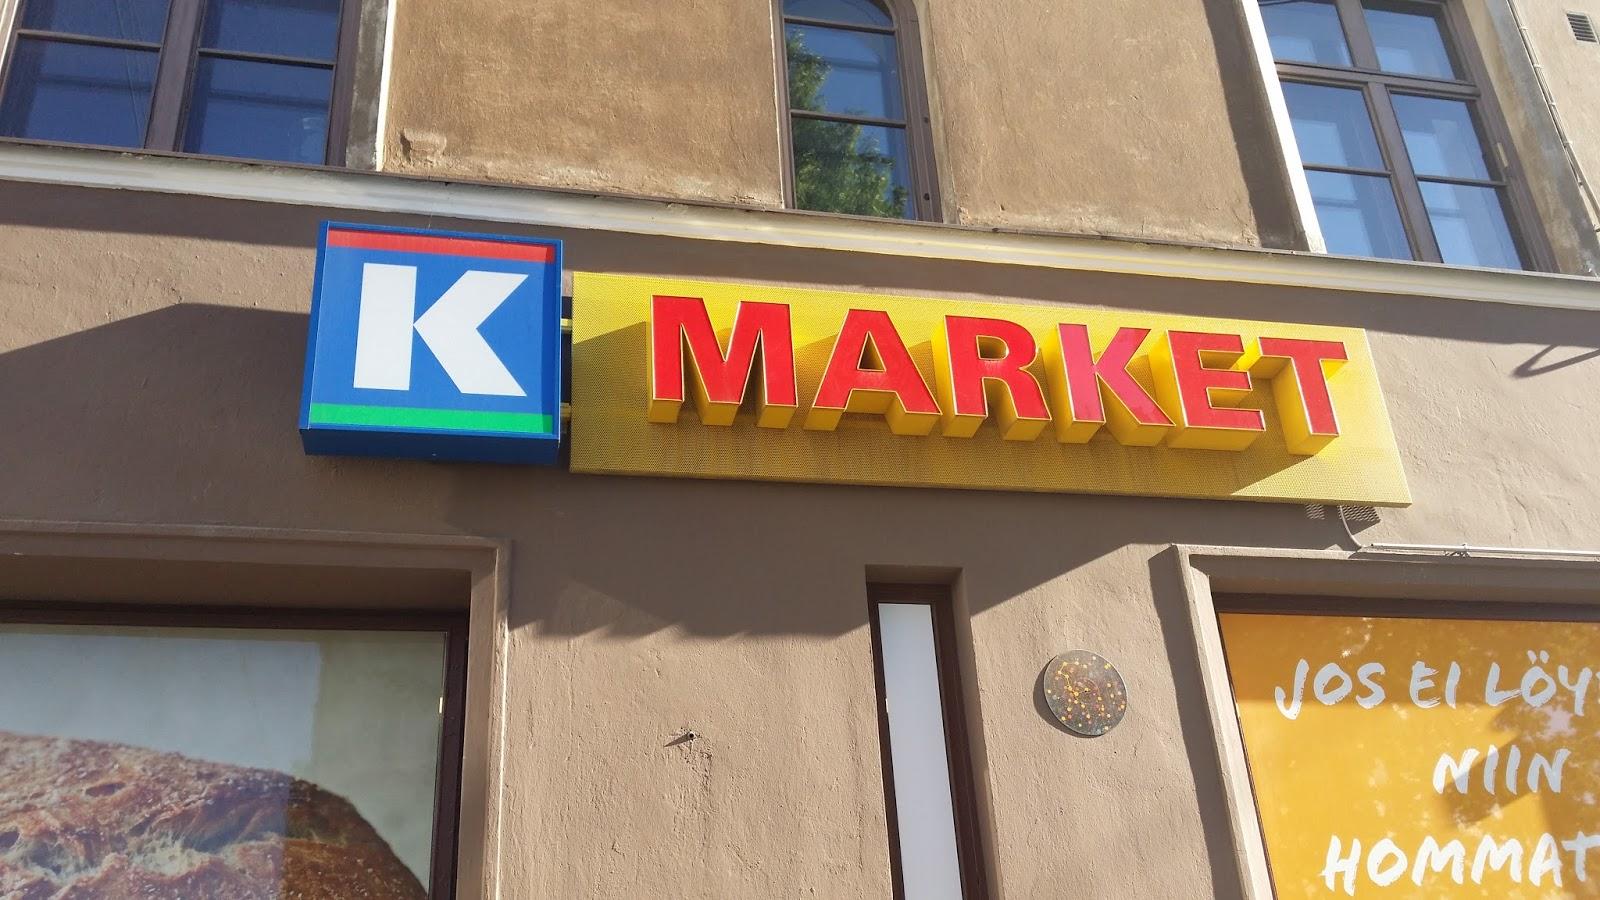 K Market Malminmäki